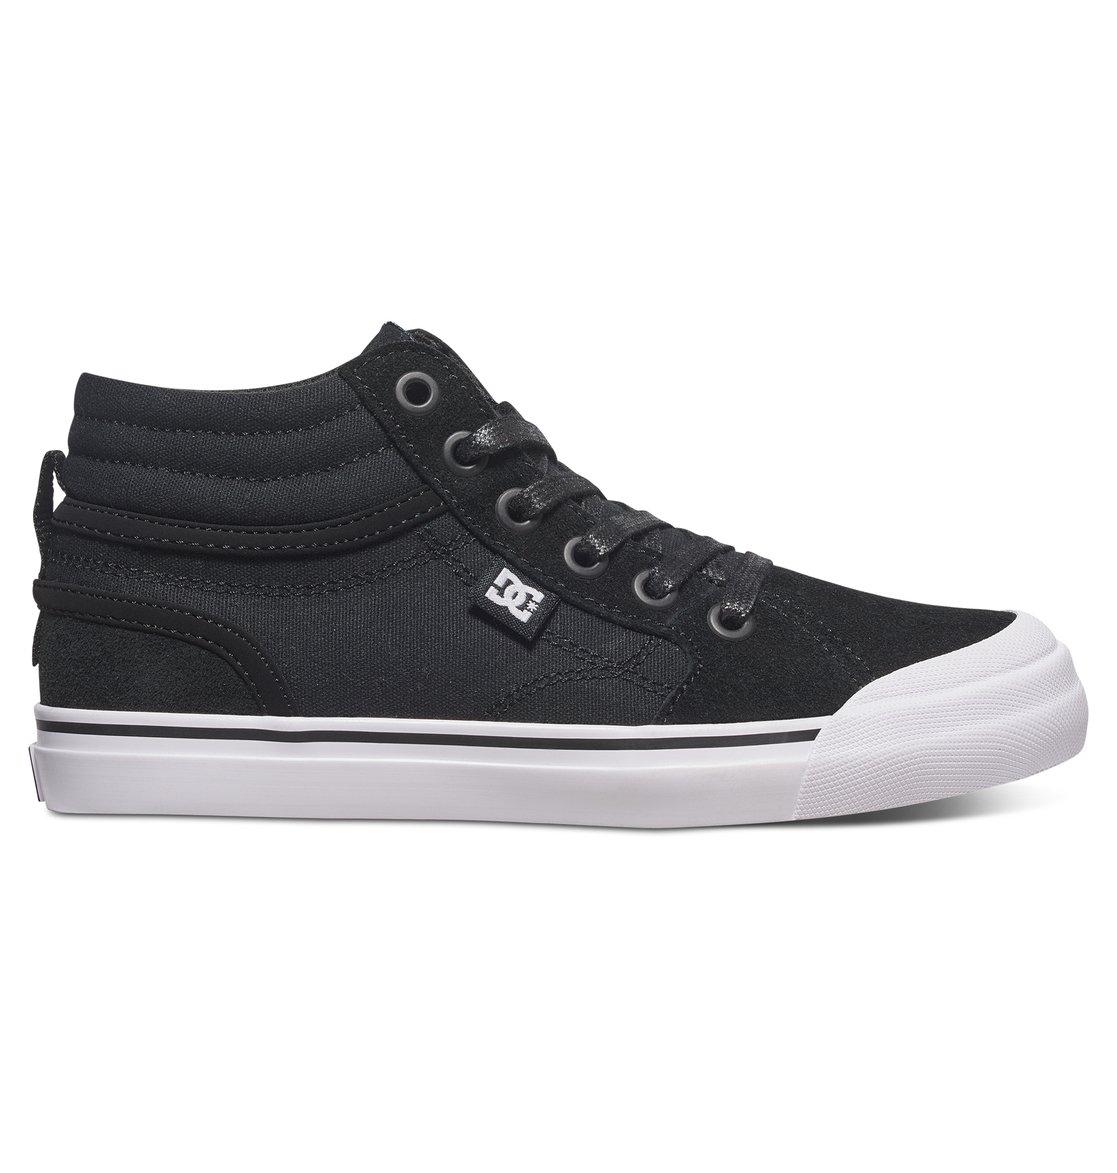 DC Shoes Hi Tops »Evan HI«, schwarz, Black/white